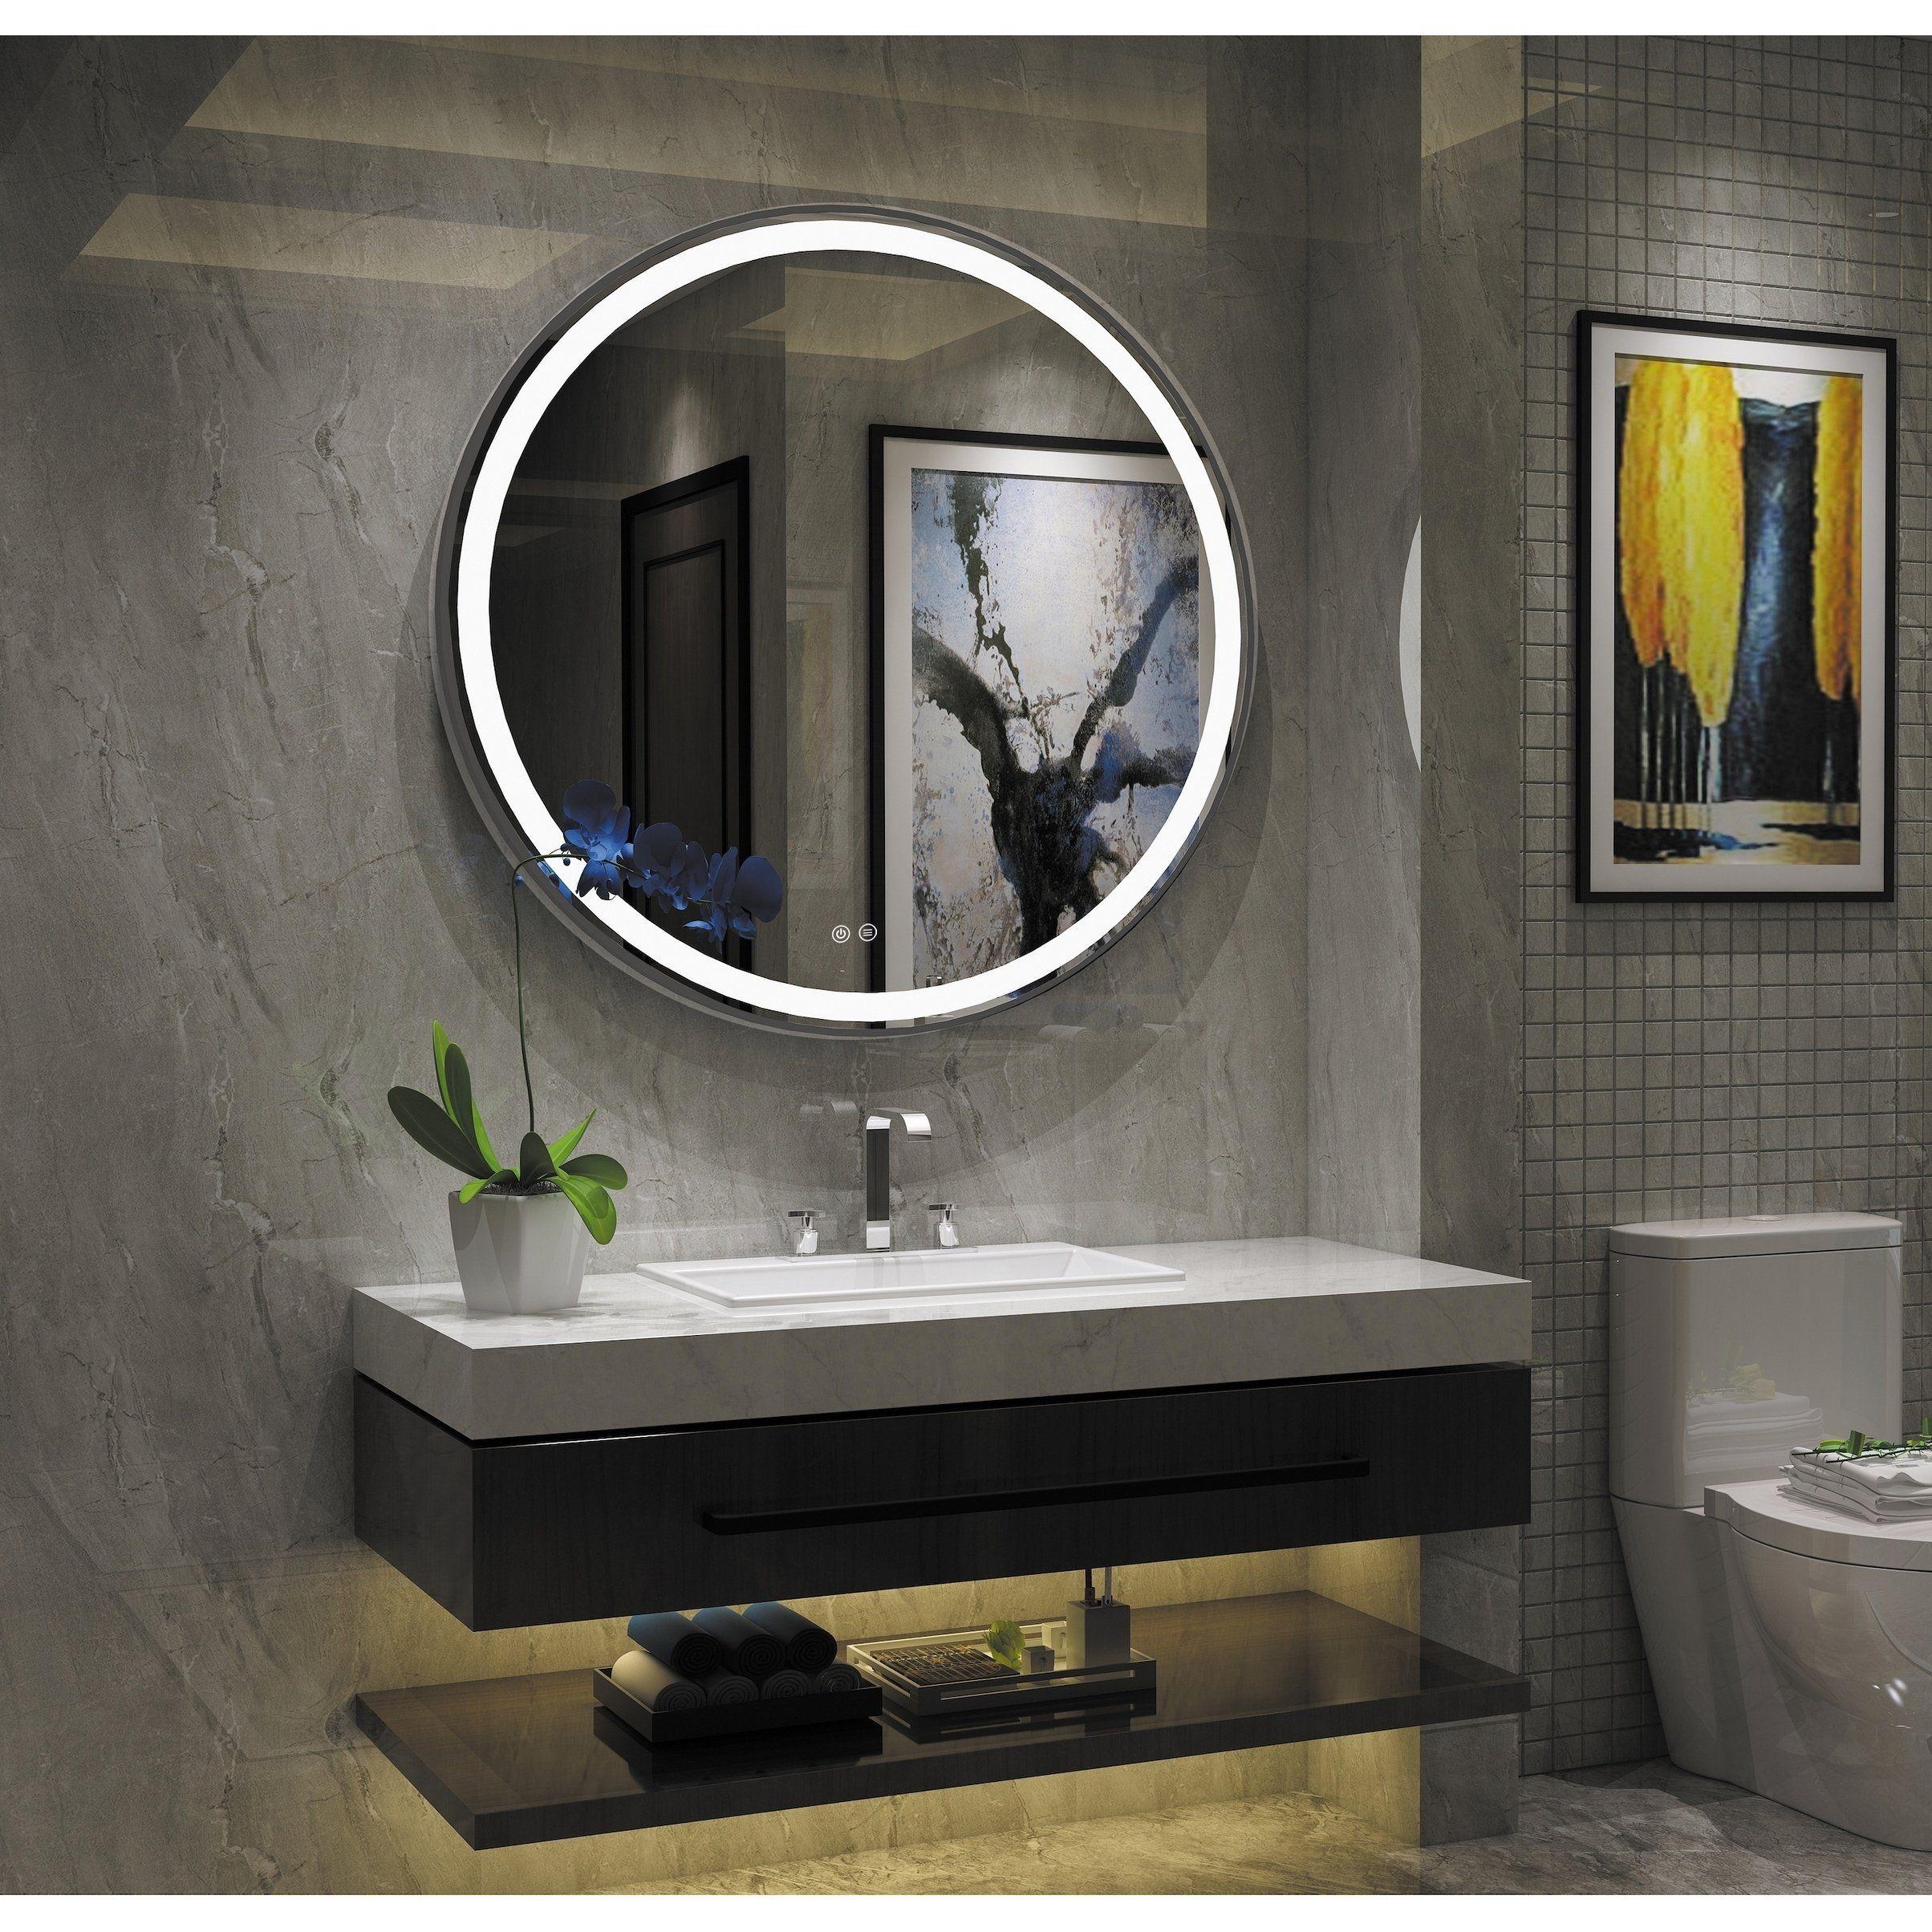 Frameless Wall Mounted Led Bathroom Mirror White Led Mirror Bathroom Bathroom Interior Bathroom Interior Design [ 2408 x 2408 Pixel ]